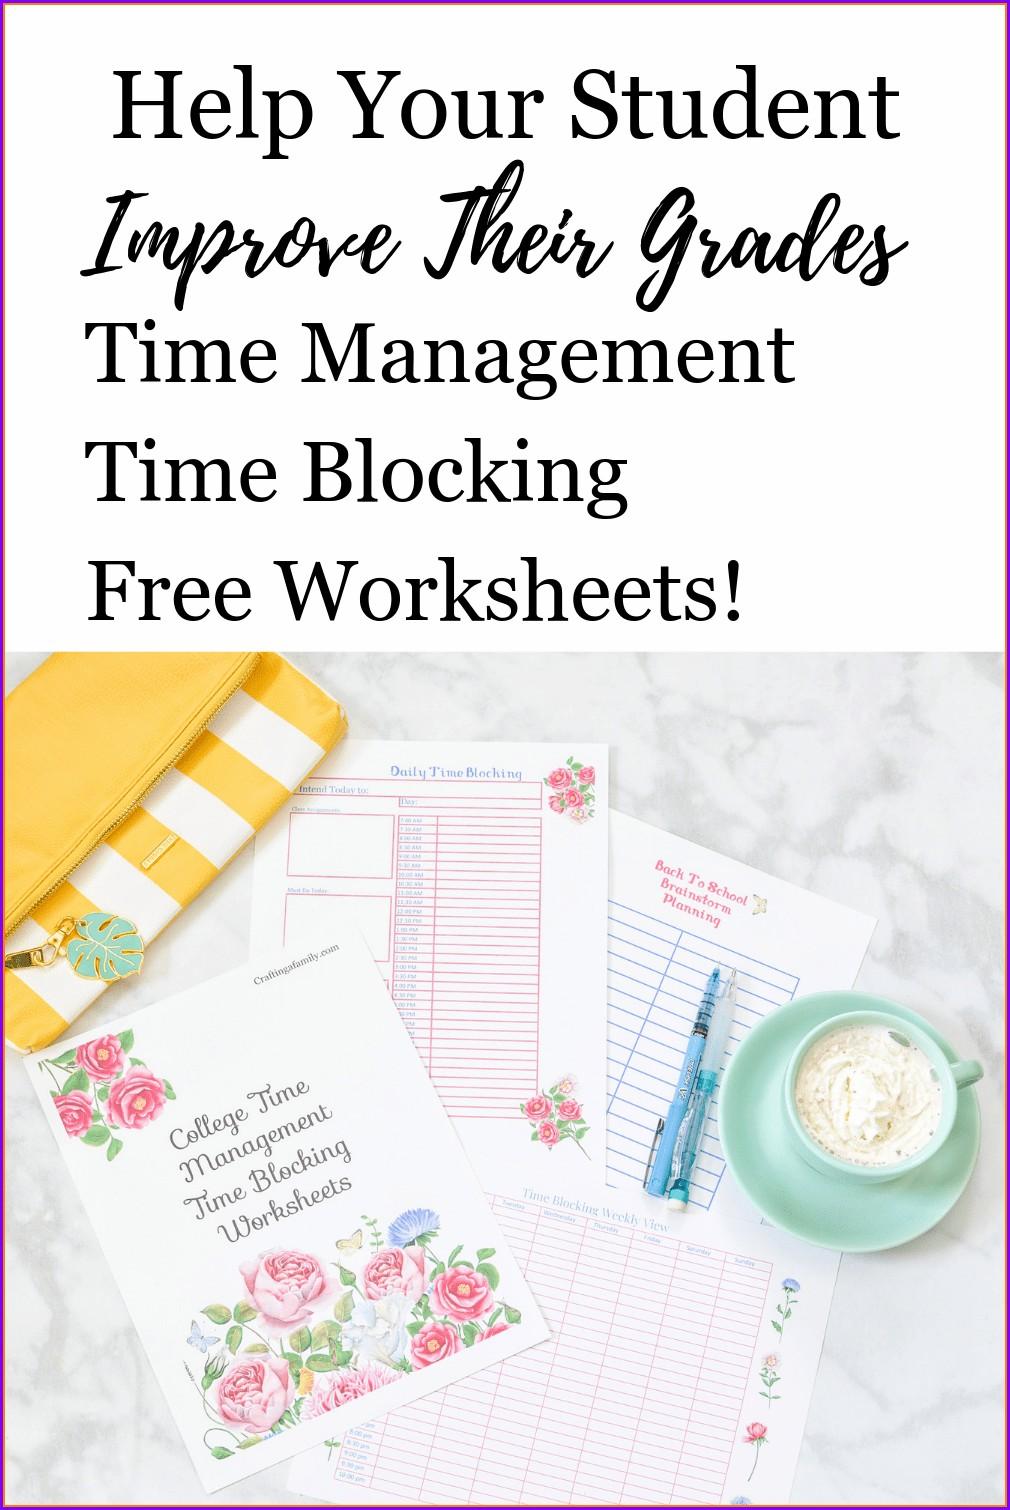 Free Printable Time Management Worksheets